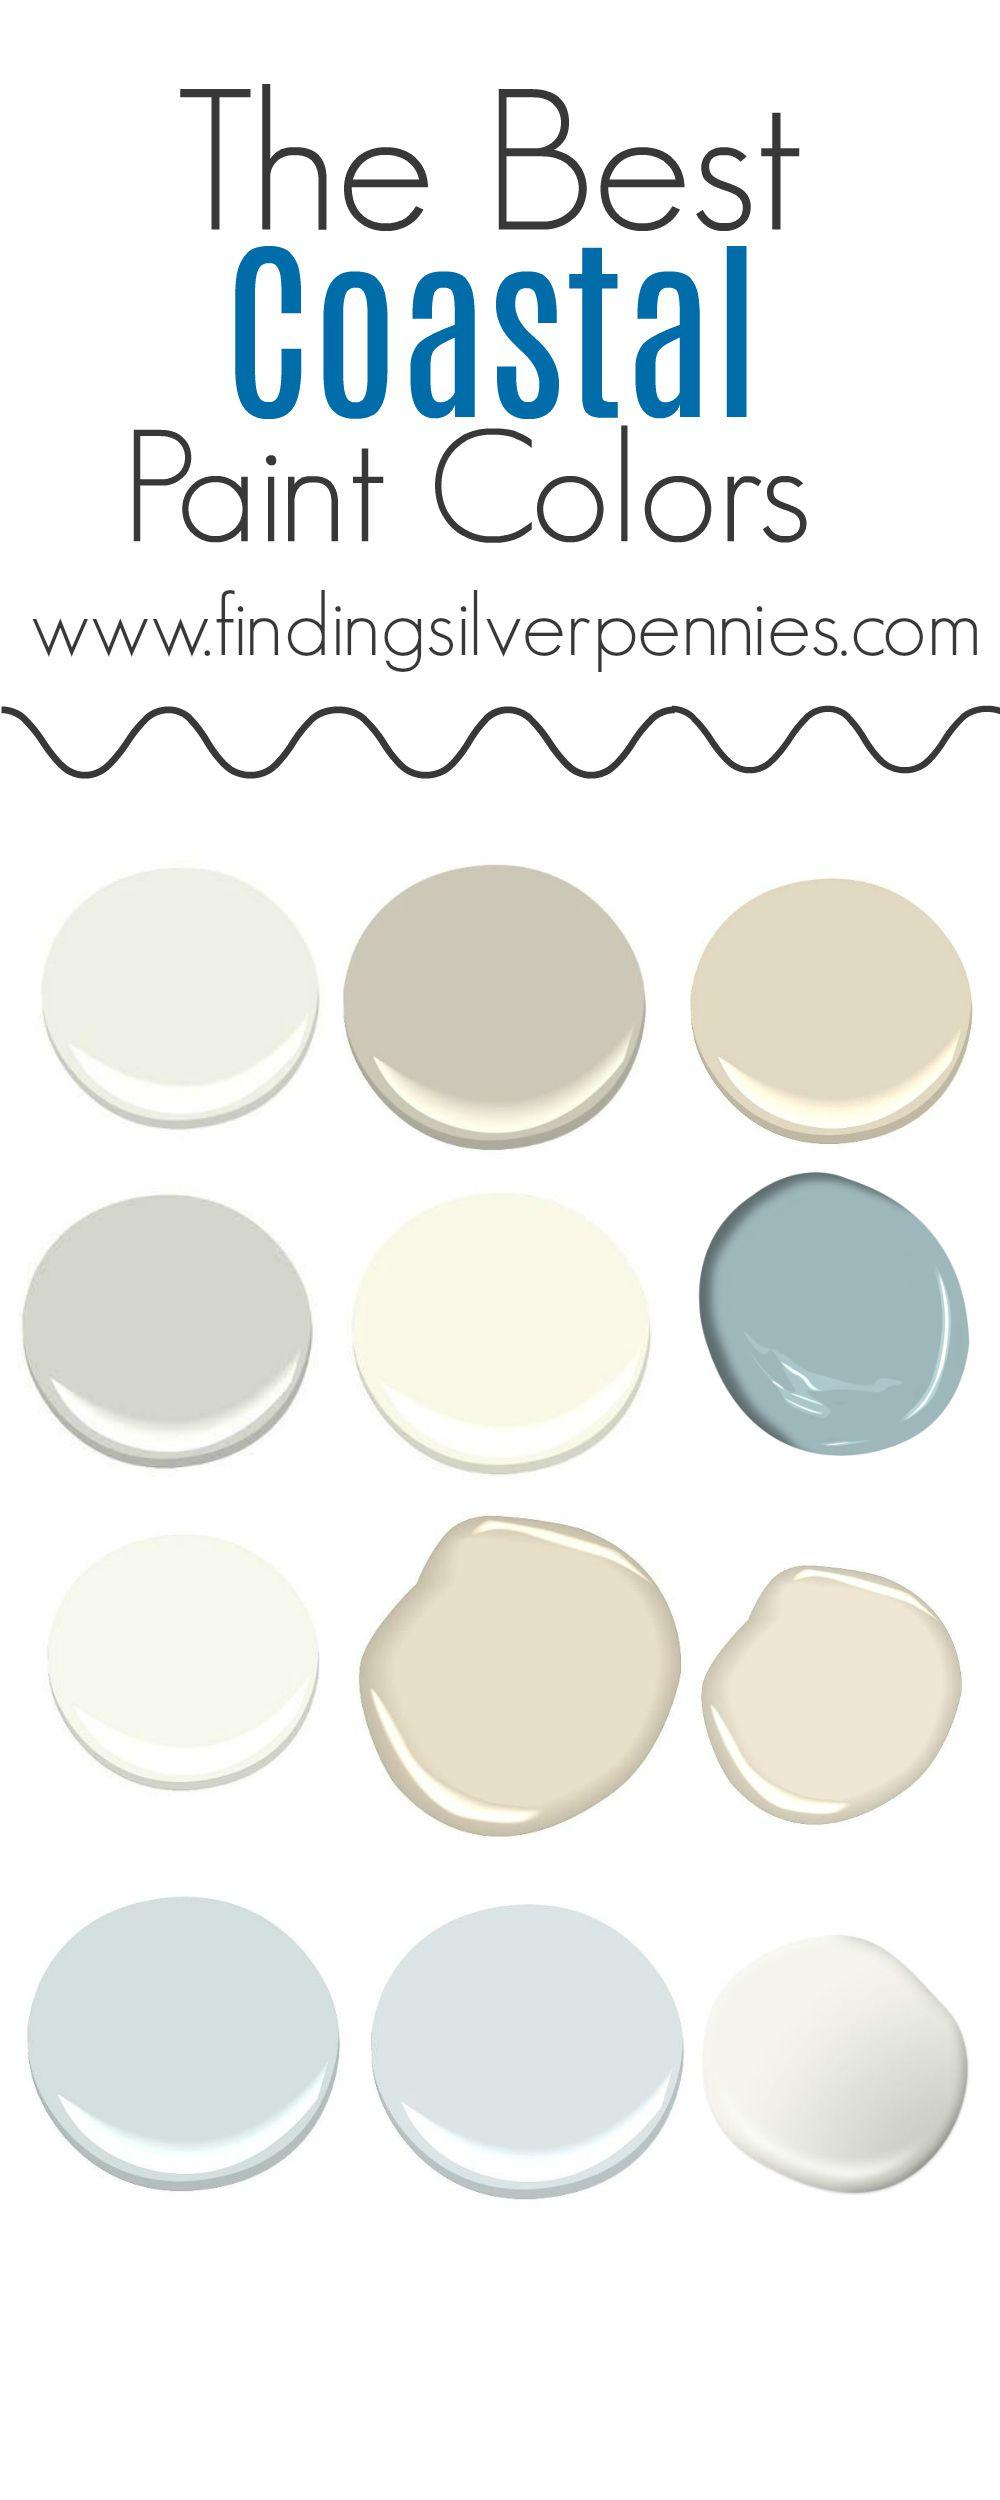 The Colors Of Our Home Coastal Paint Colors Coastal Paint